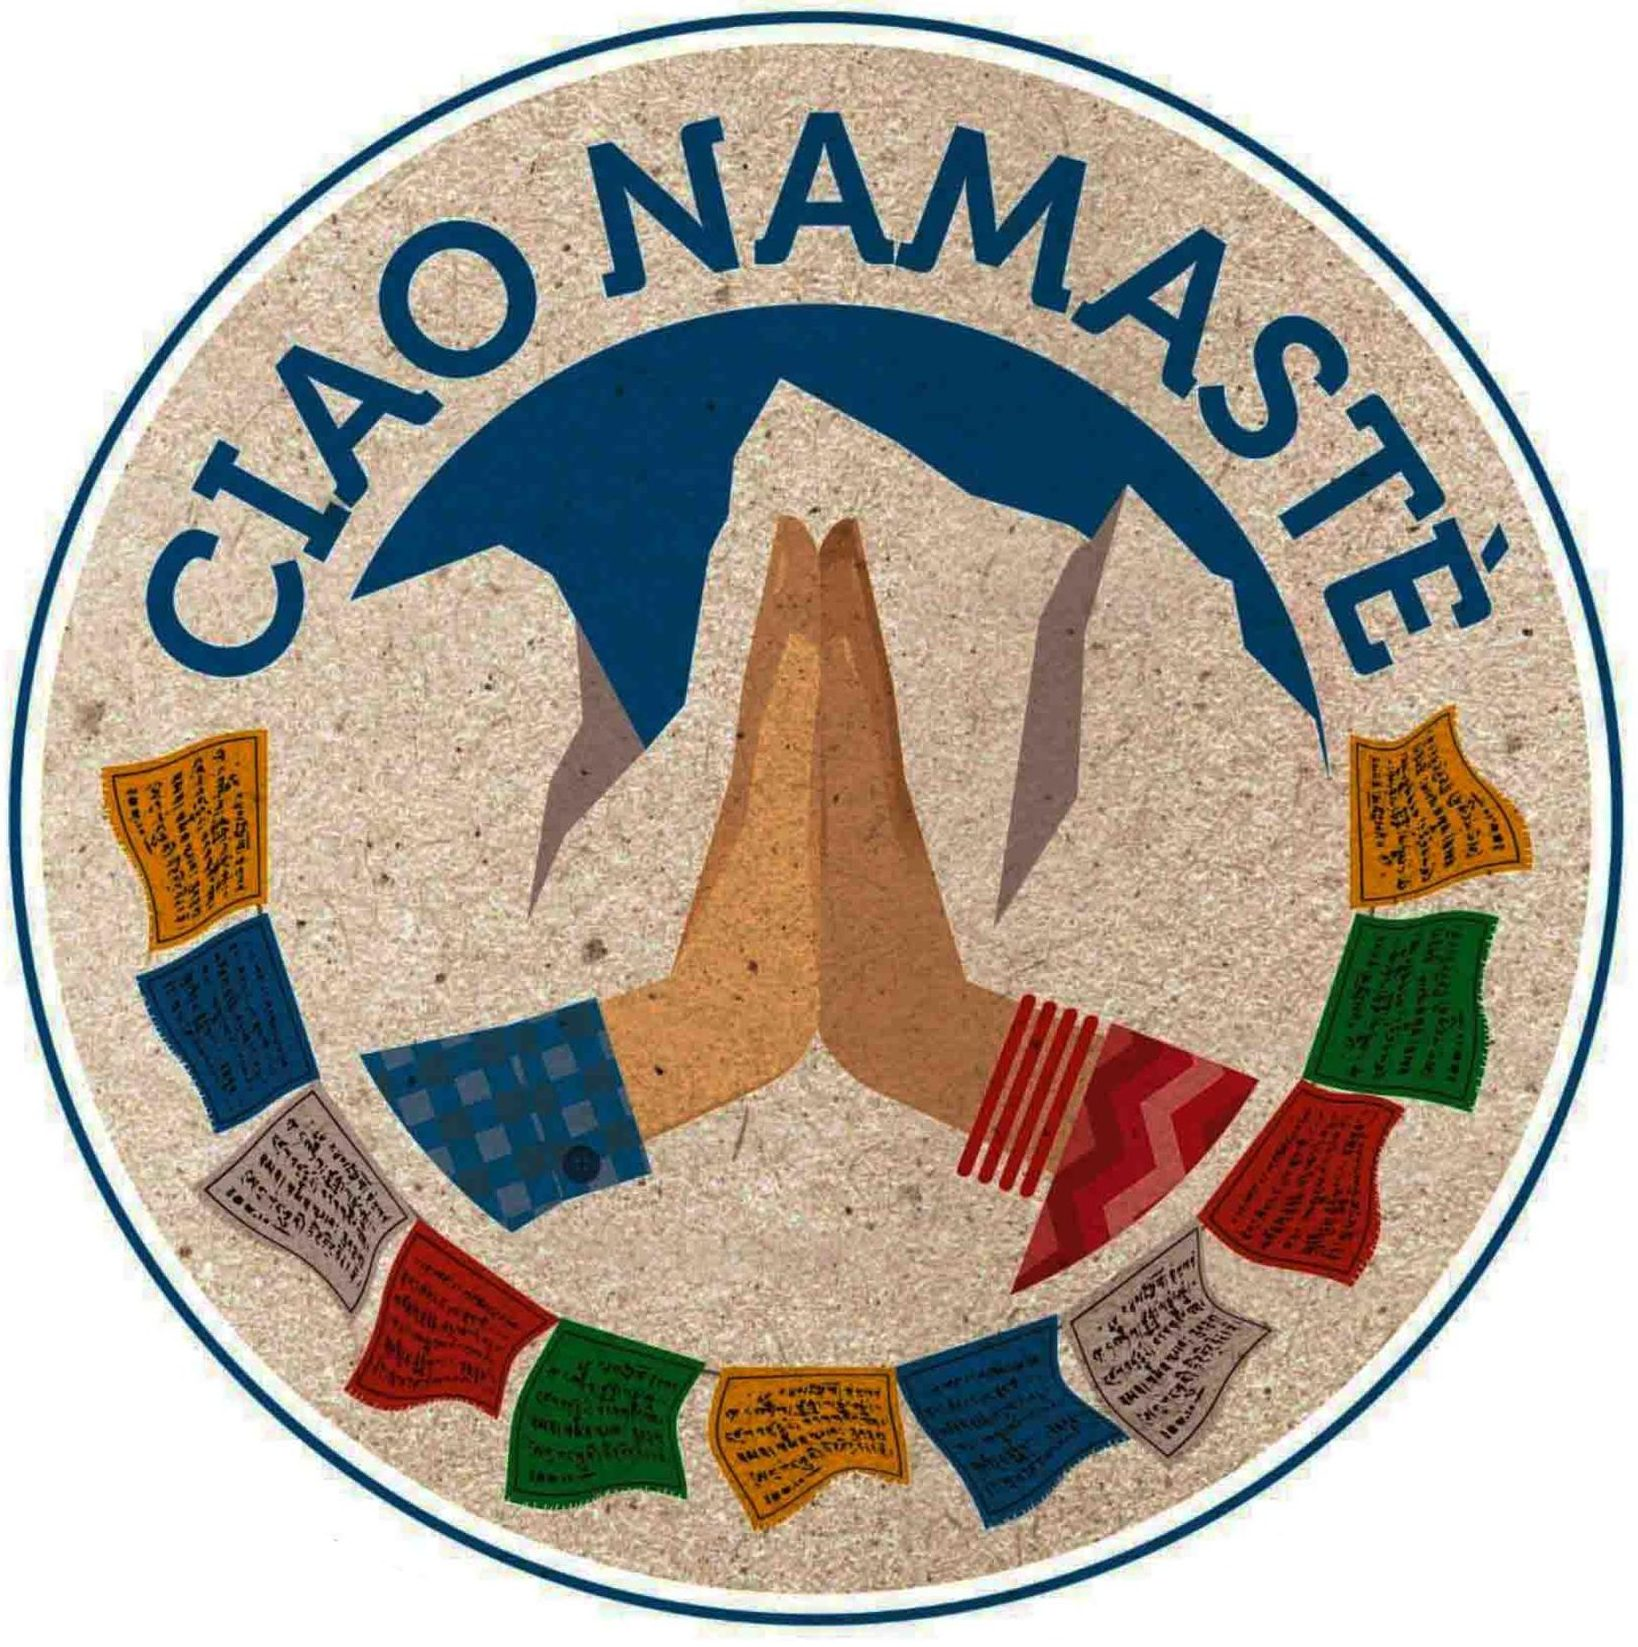 CiaoNamastè